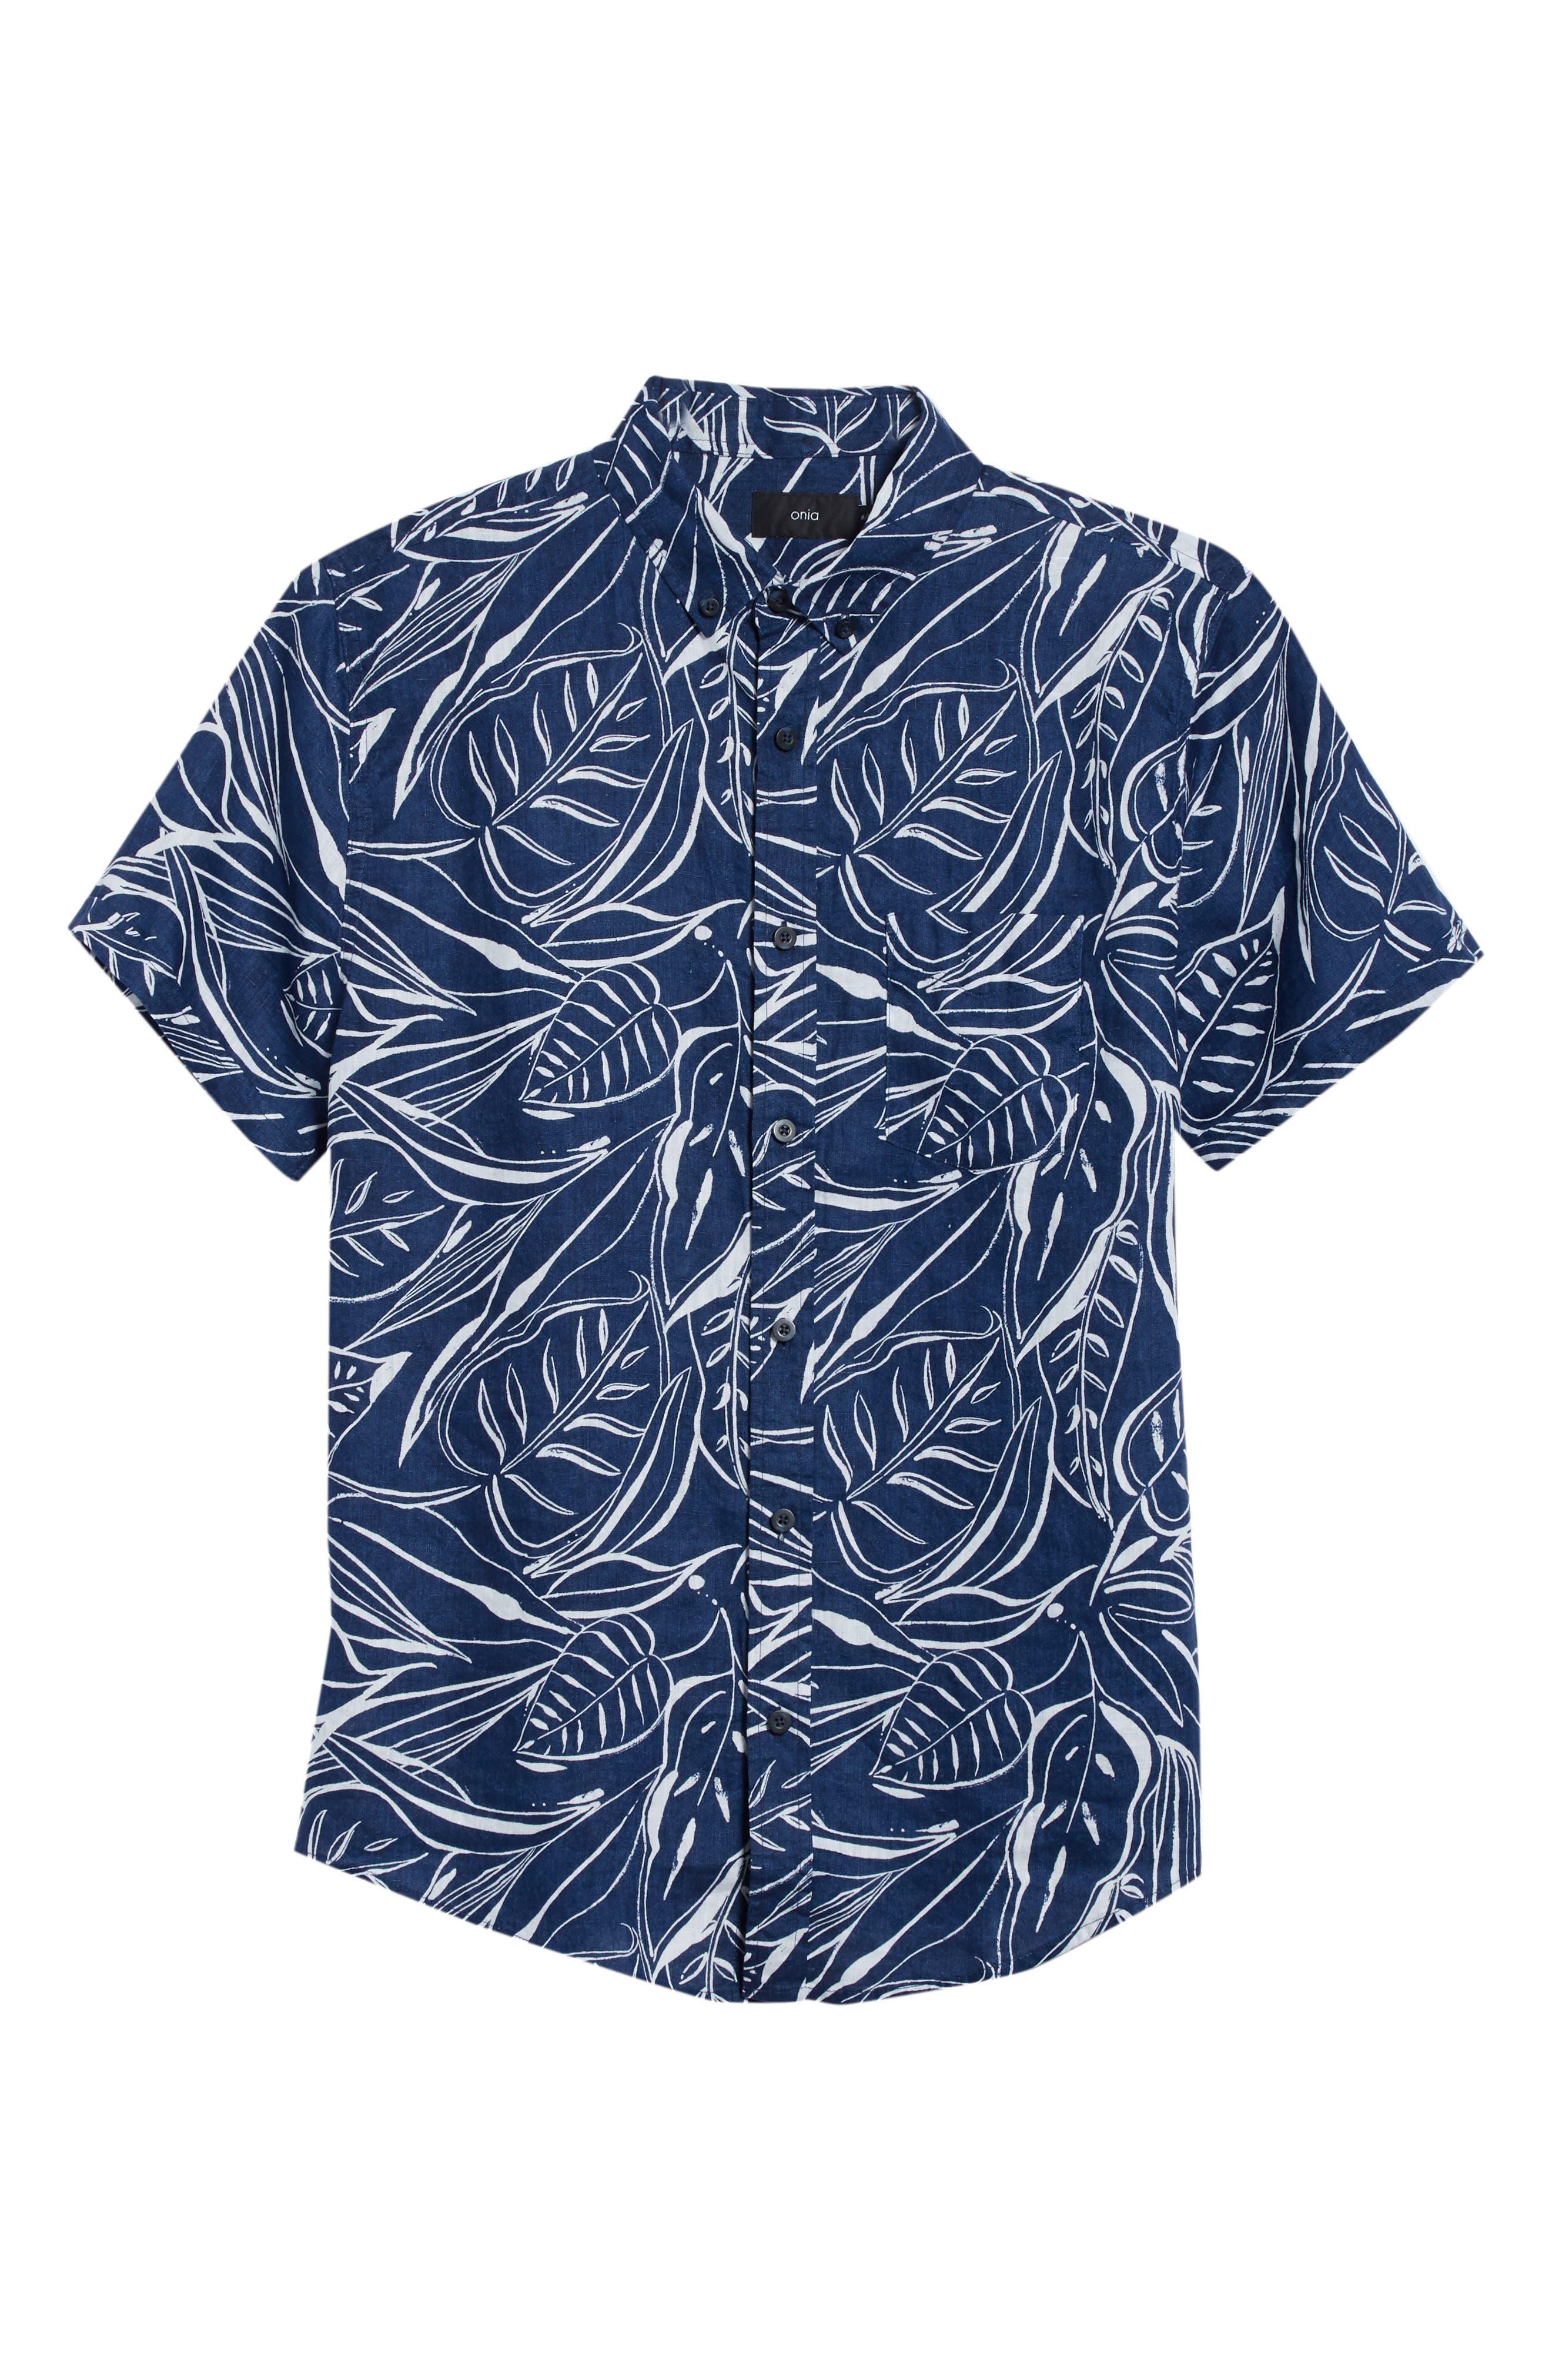 Jack Palm Print Linen Shirt,                             Alternate thumbnail 6, color,                             DEEP NAVY WHITE